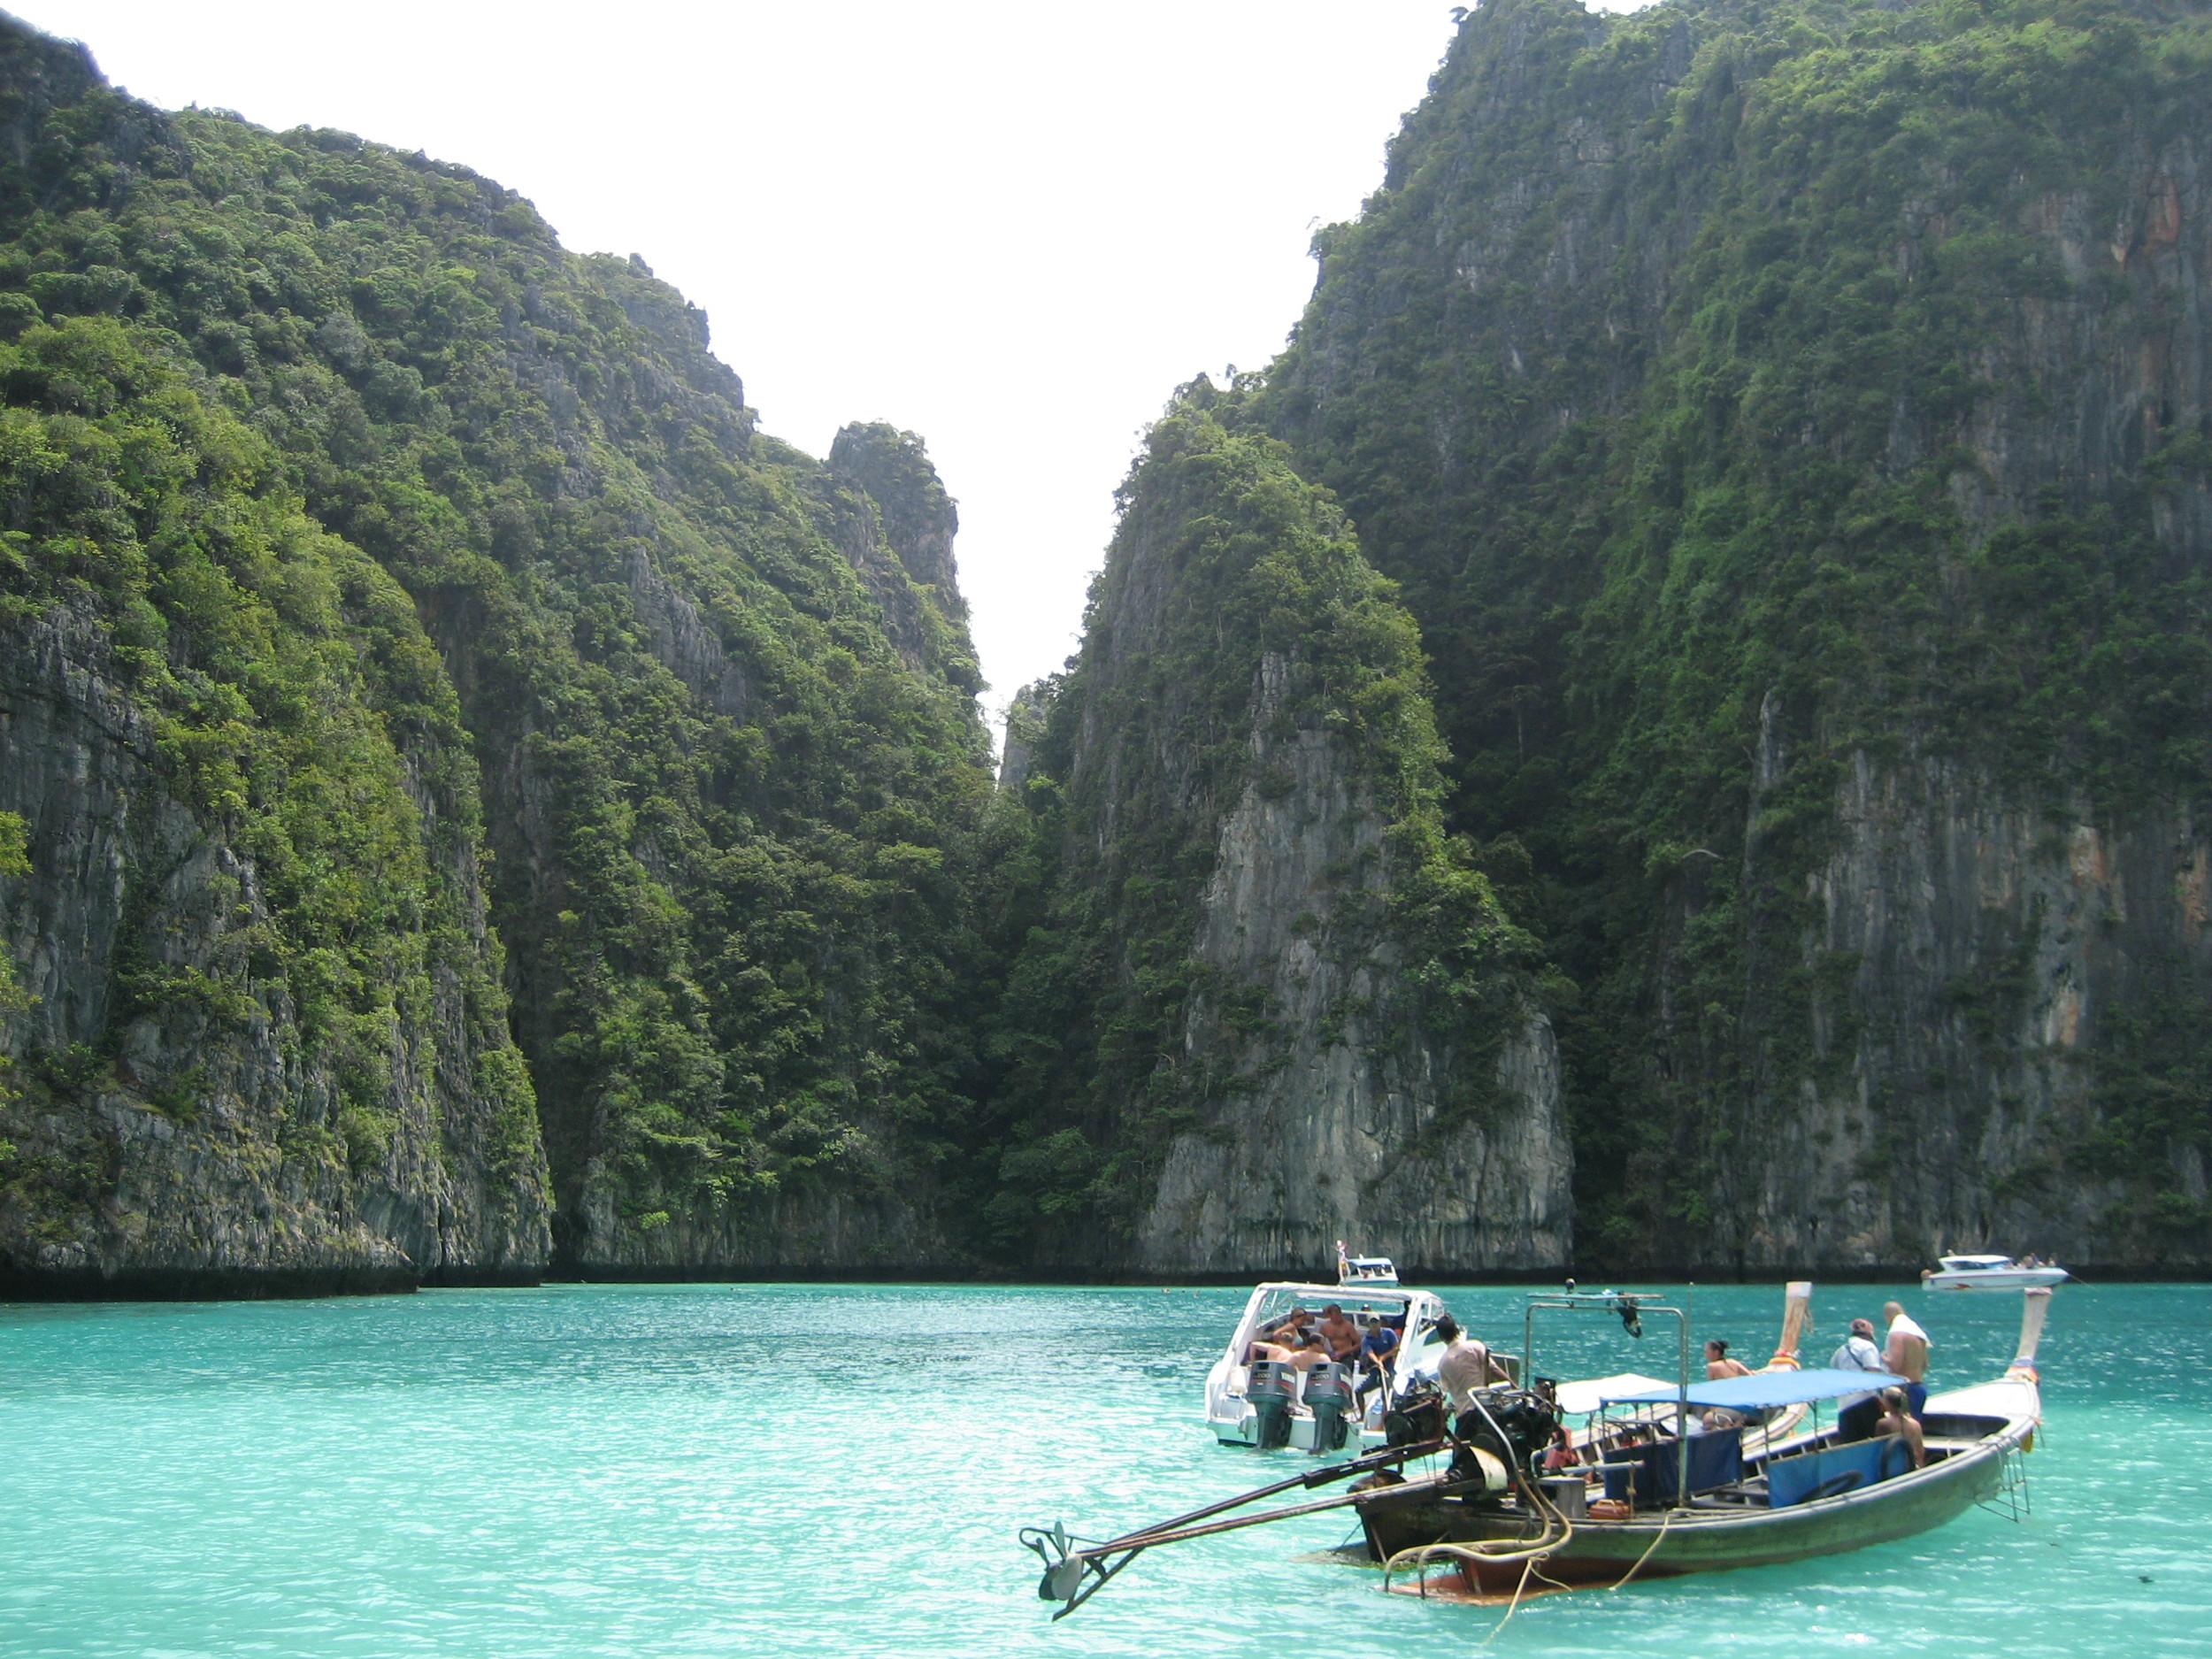 On the way to Maya Bay, Phi Phi Islands, Thailand